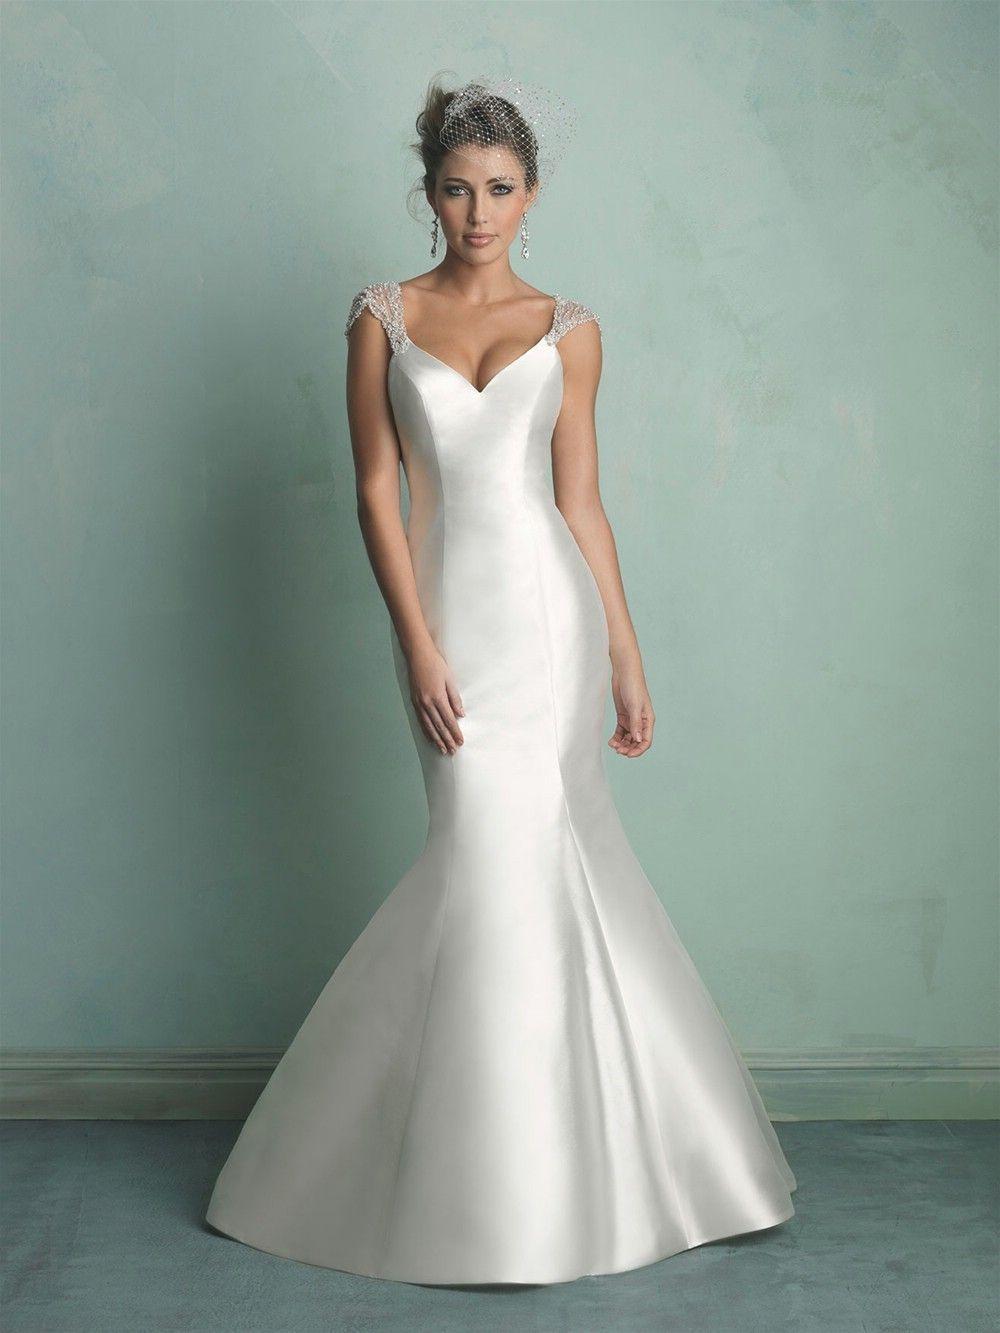 Allure Wedding Dresses - Style 9158 [9158] : Wedding Dresses ...